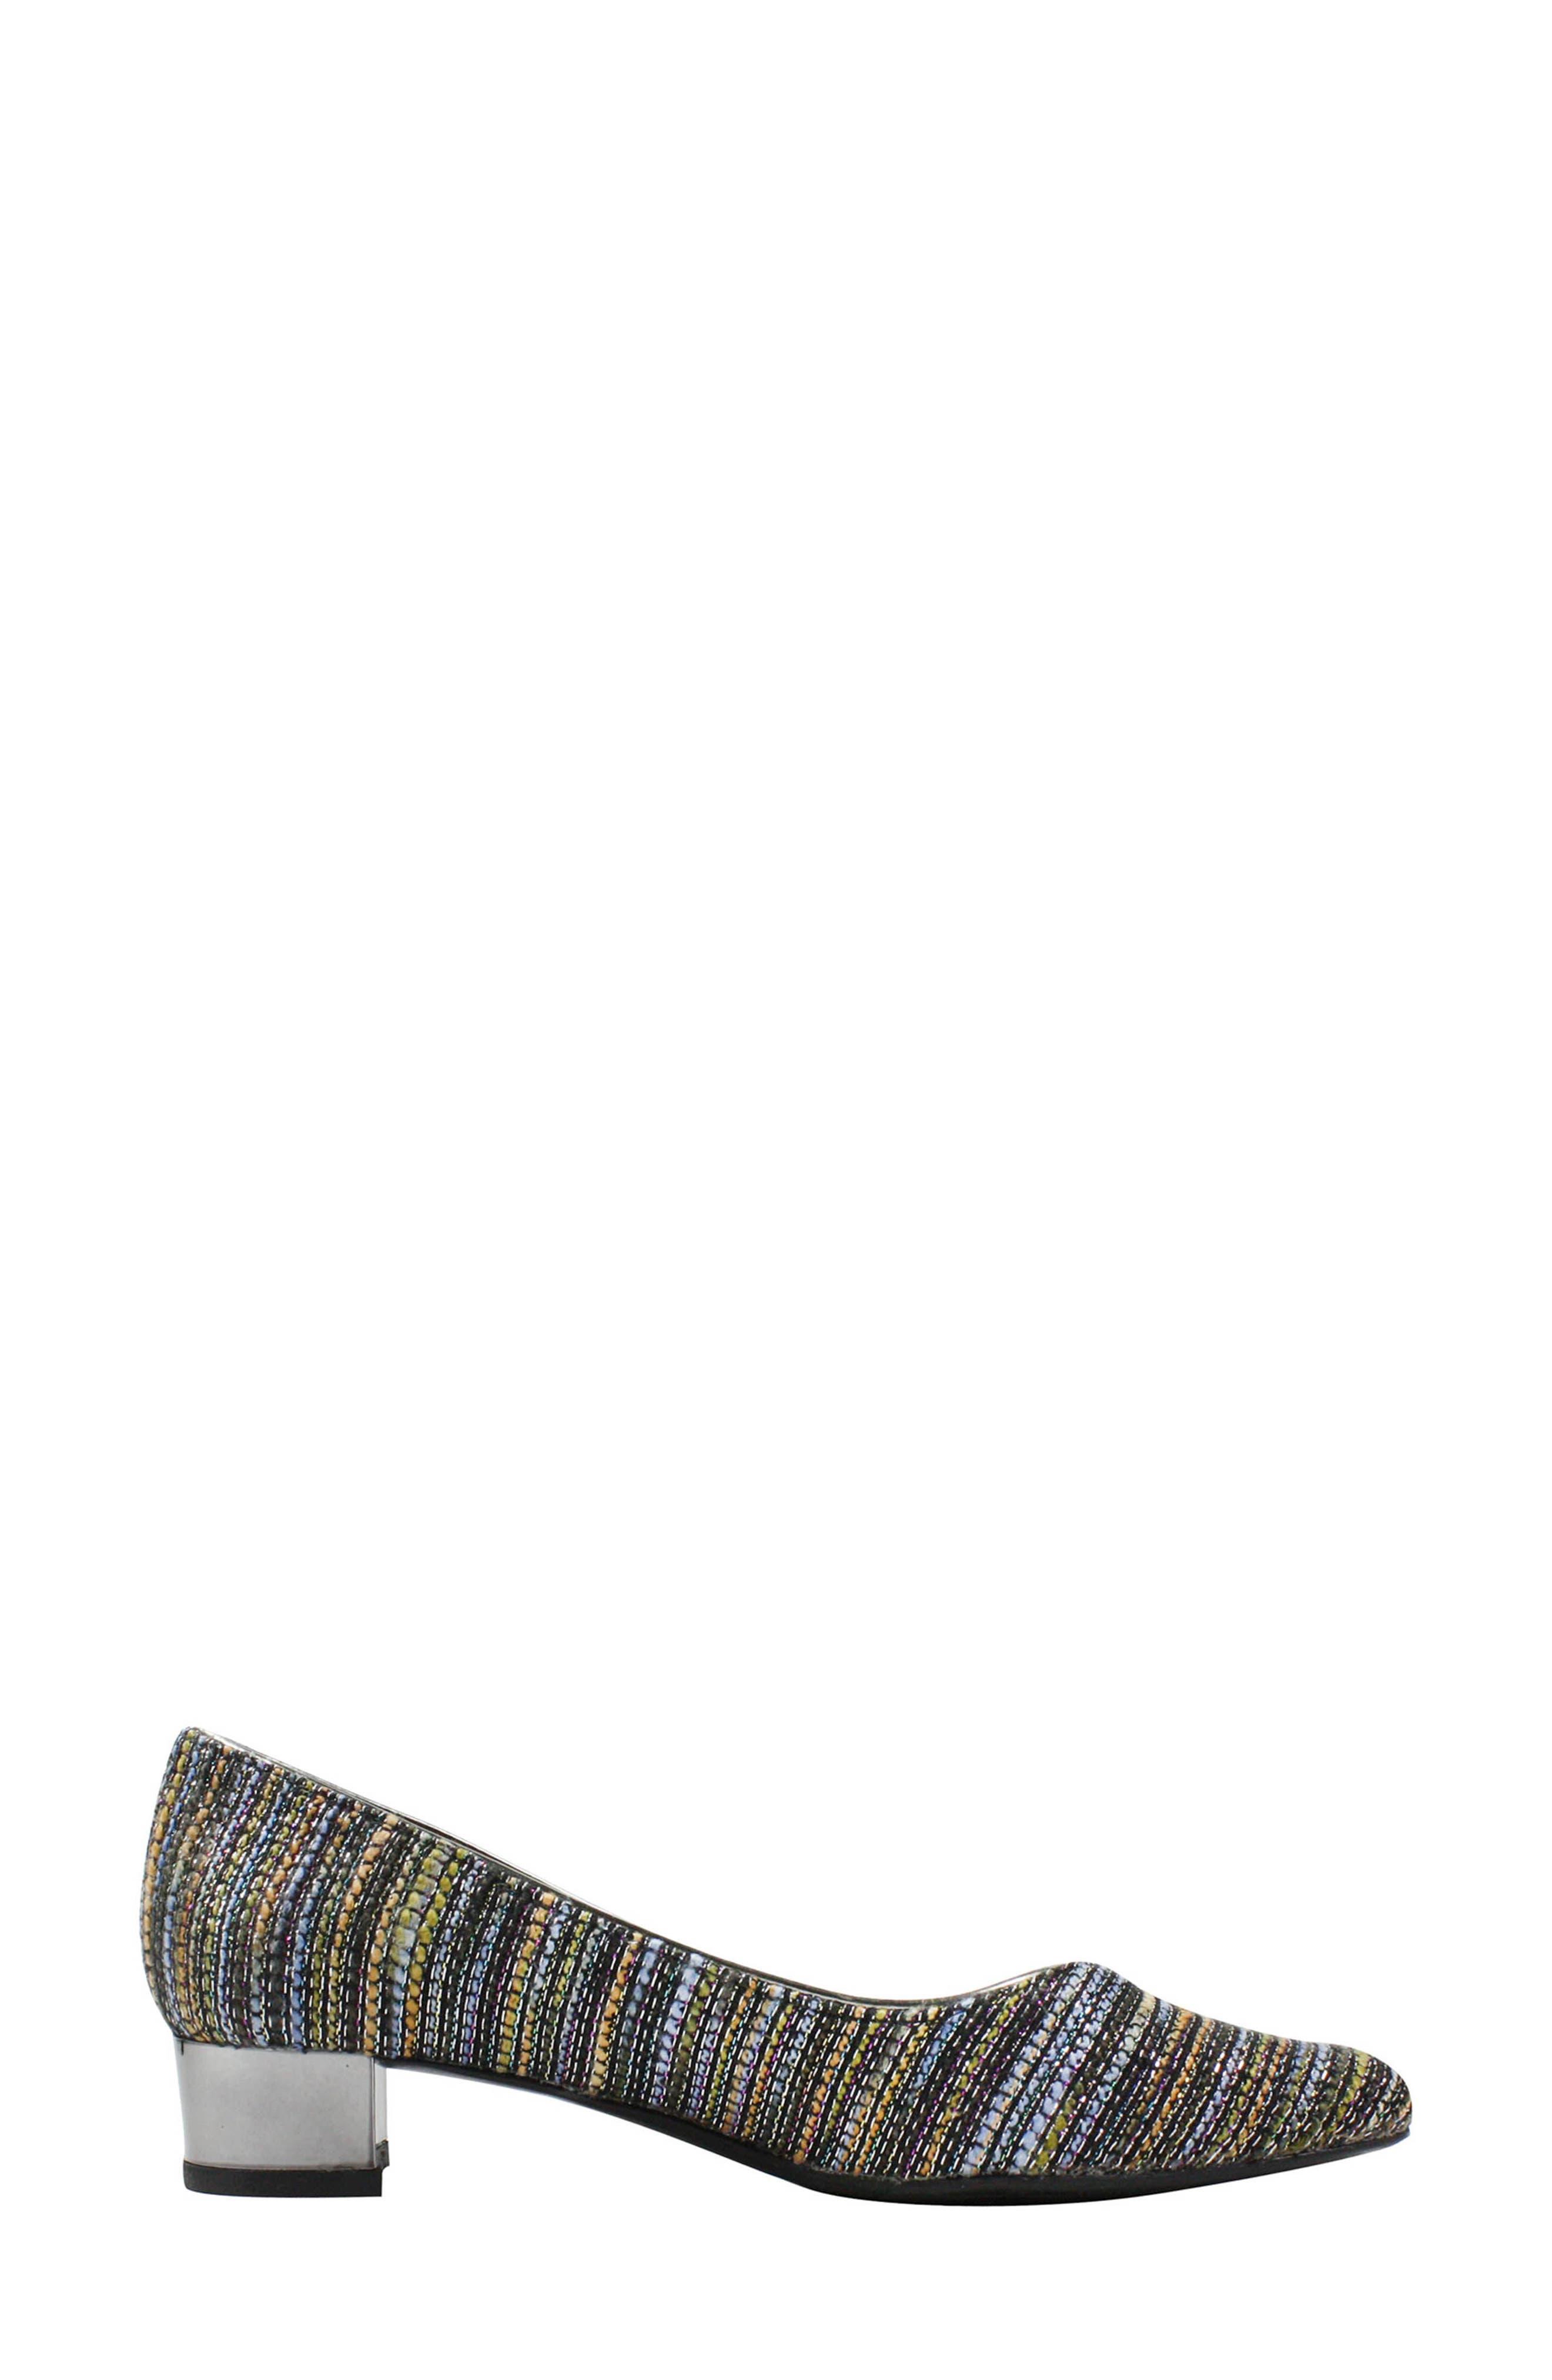 'Bambalina' Block Heel Glitter Pump,                             Alternate thumbnail 7, color,